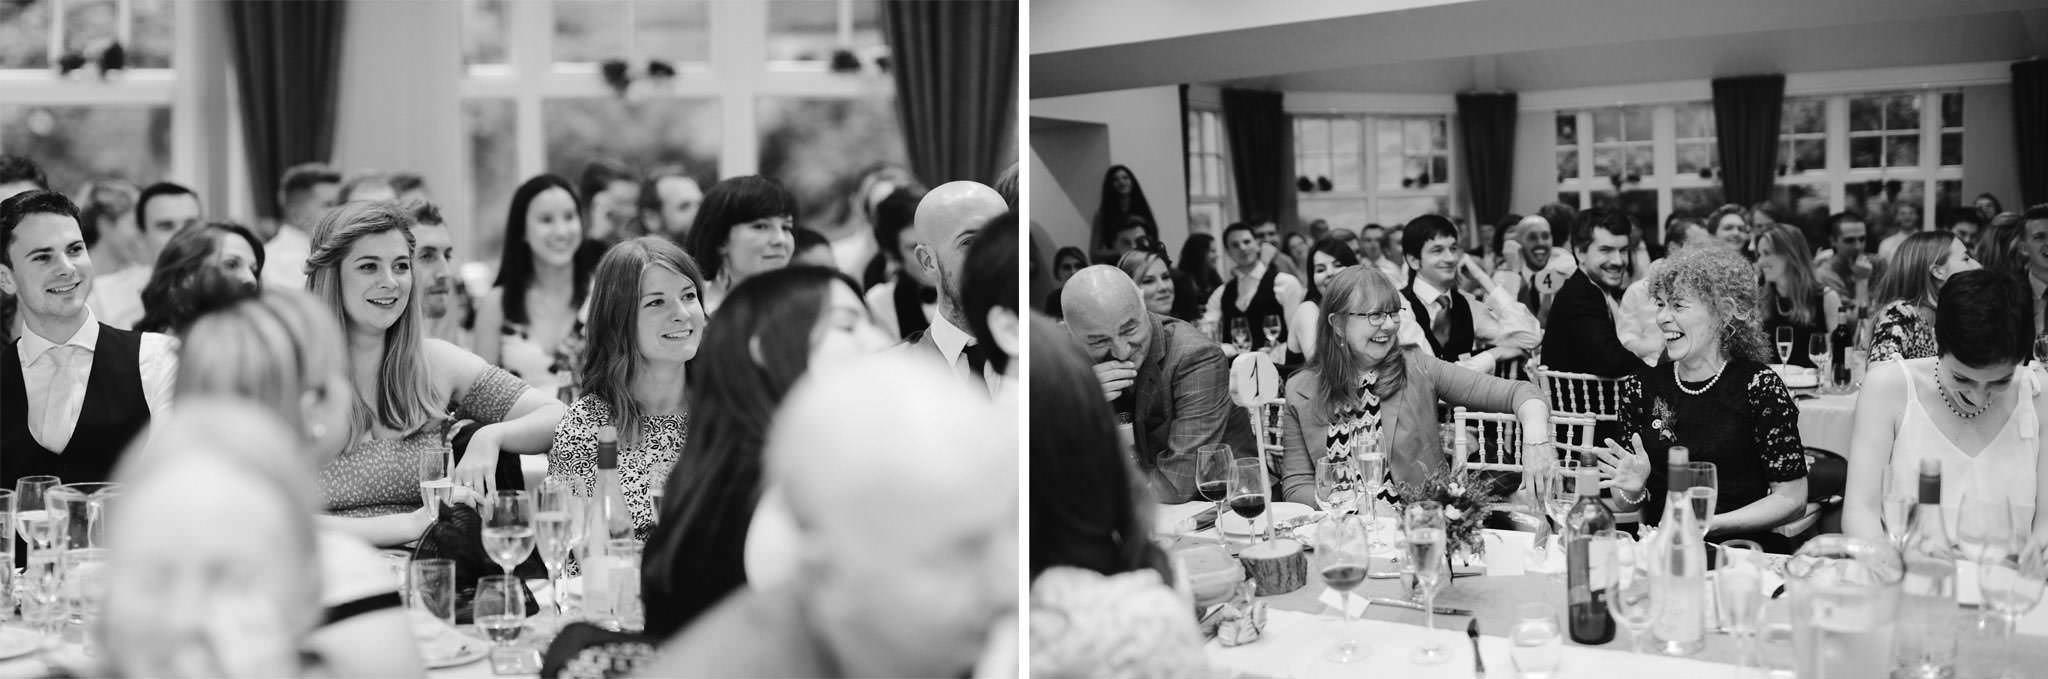 scotland-wedding-photographer-178